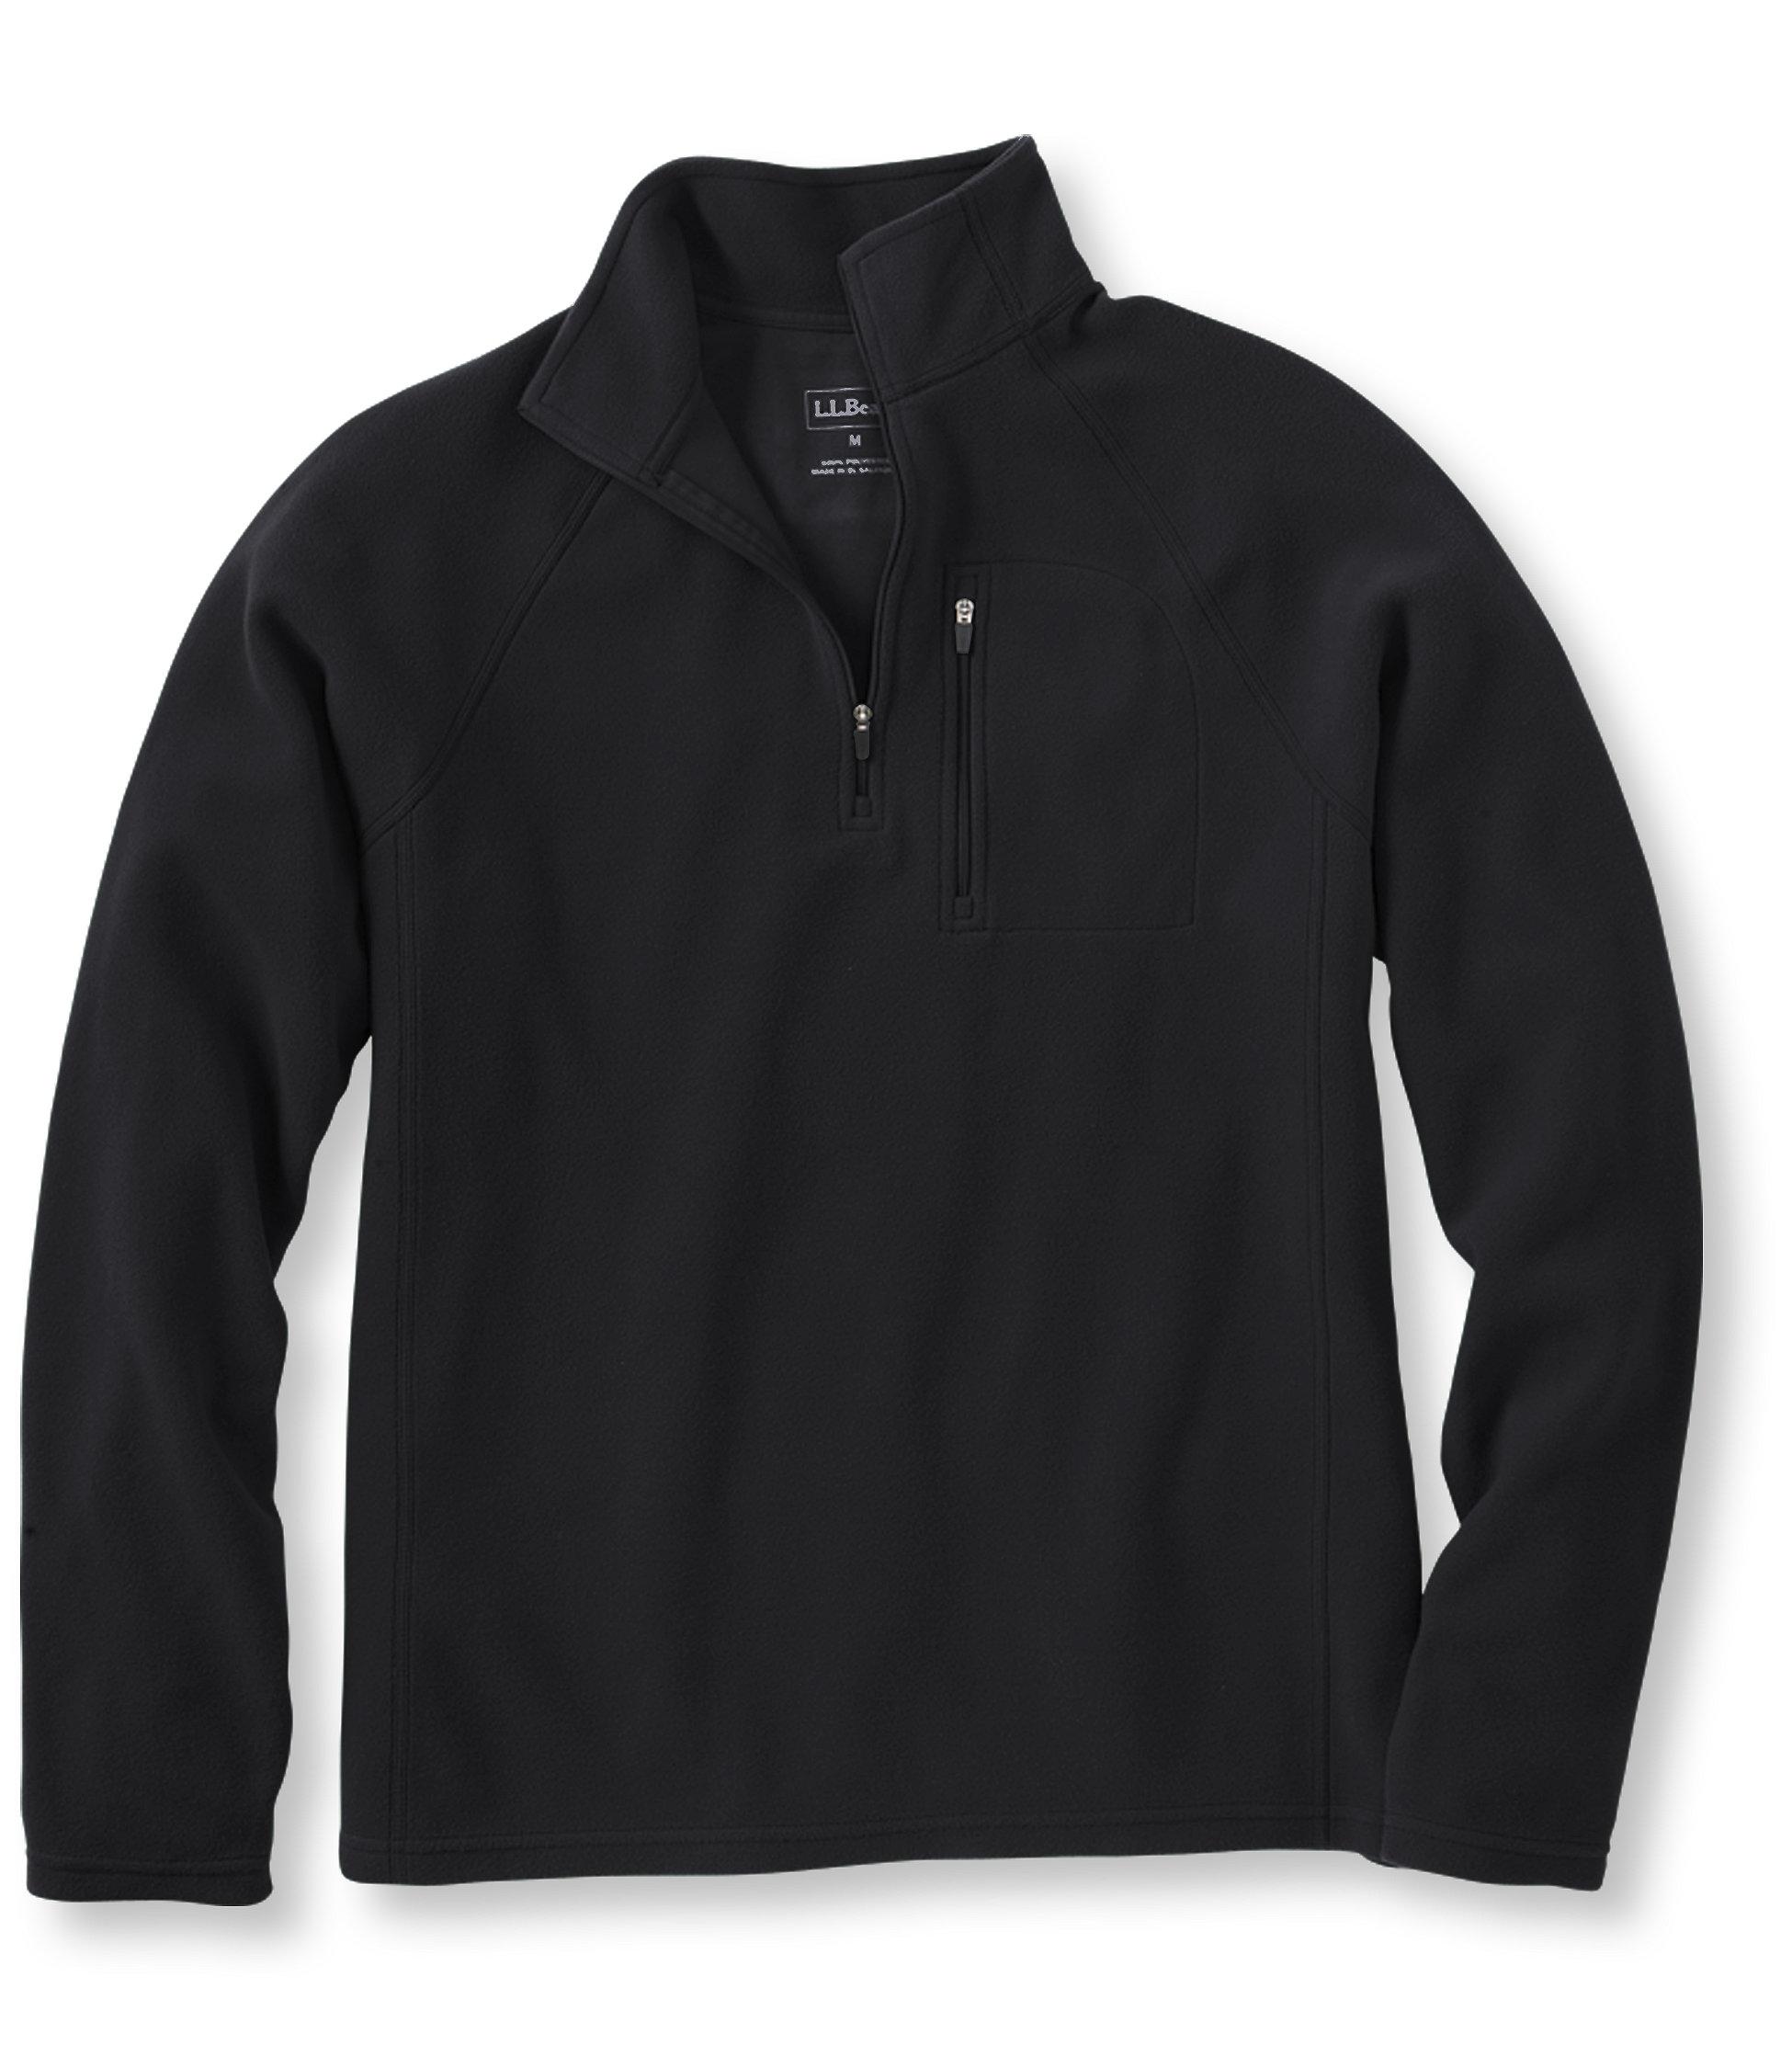 L.L.Bean Fitness Fleece, Quarter-Zip Pullover Tall